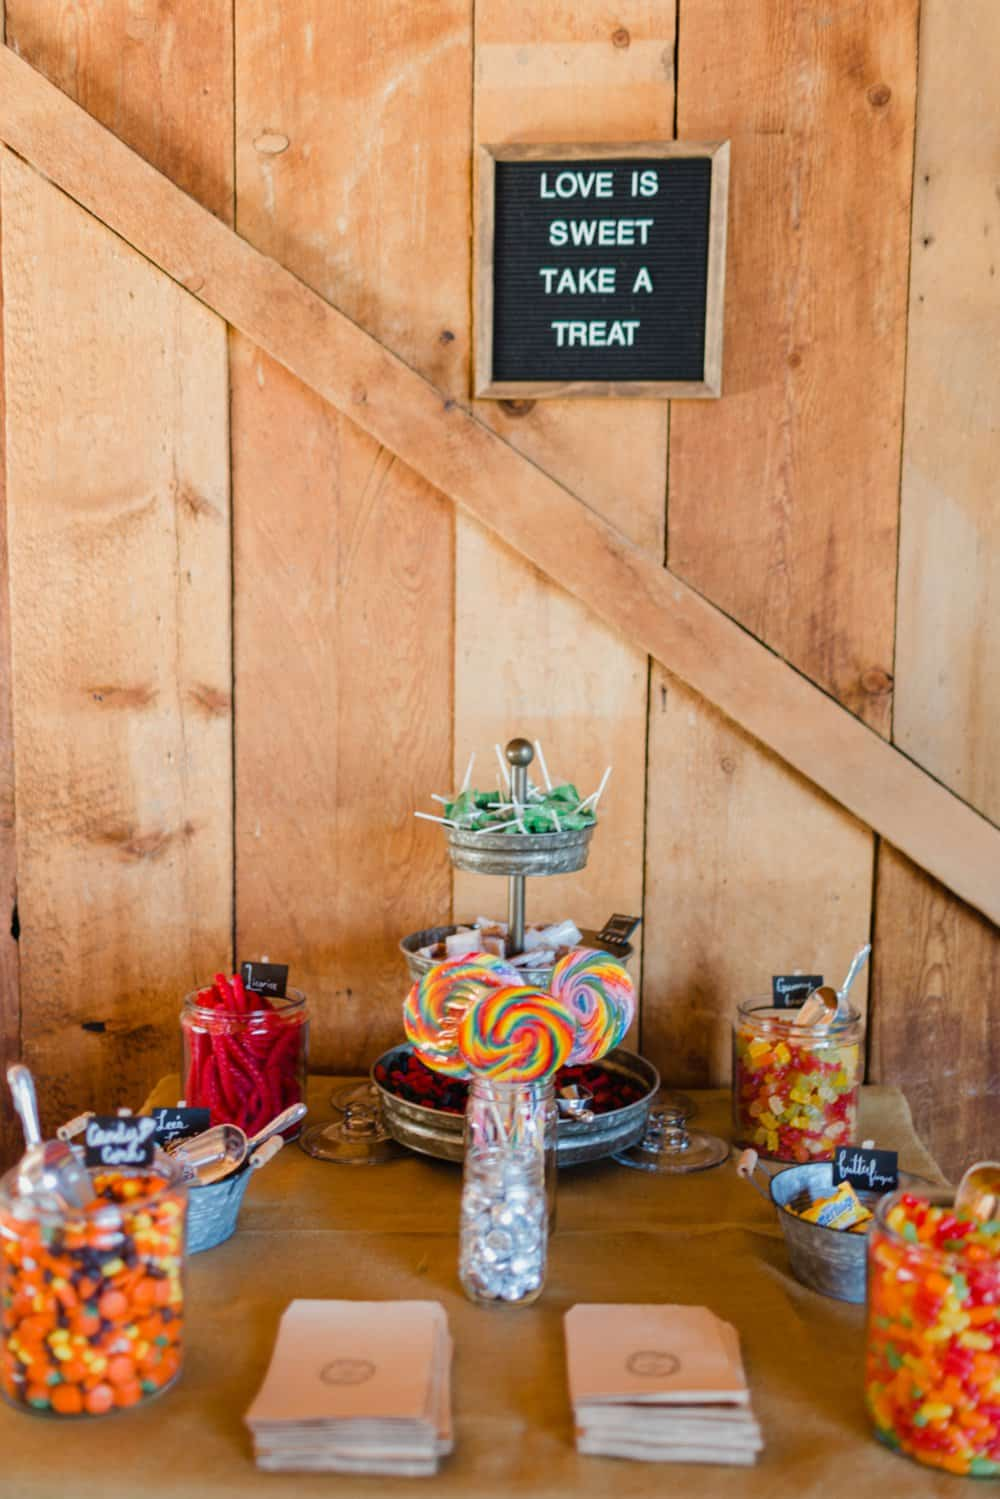 diy wedding decor, diy wedding favors, wedding candy table